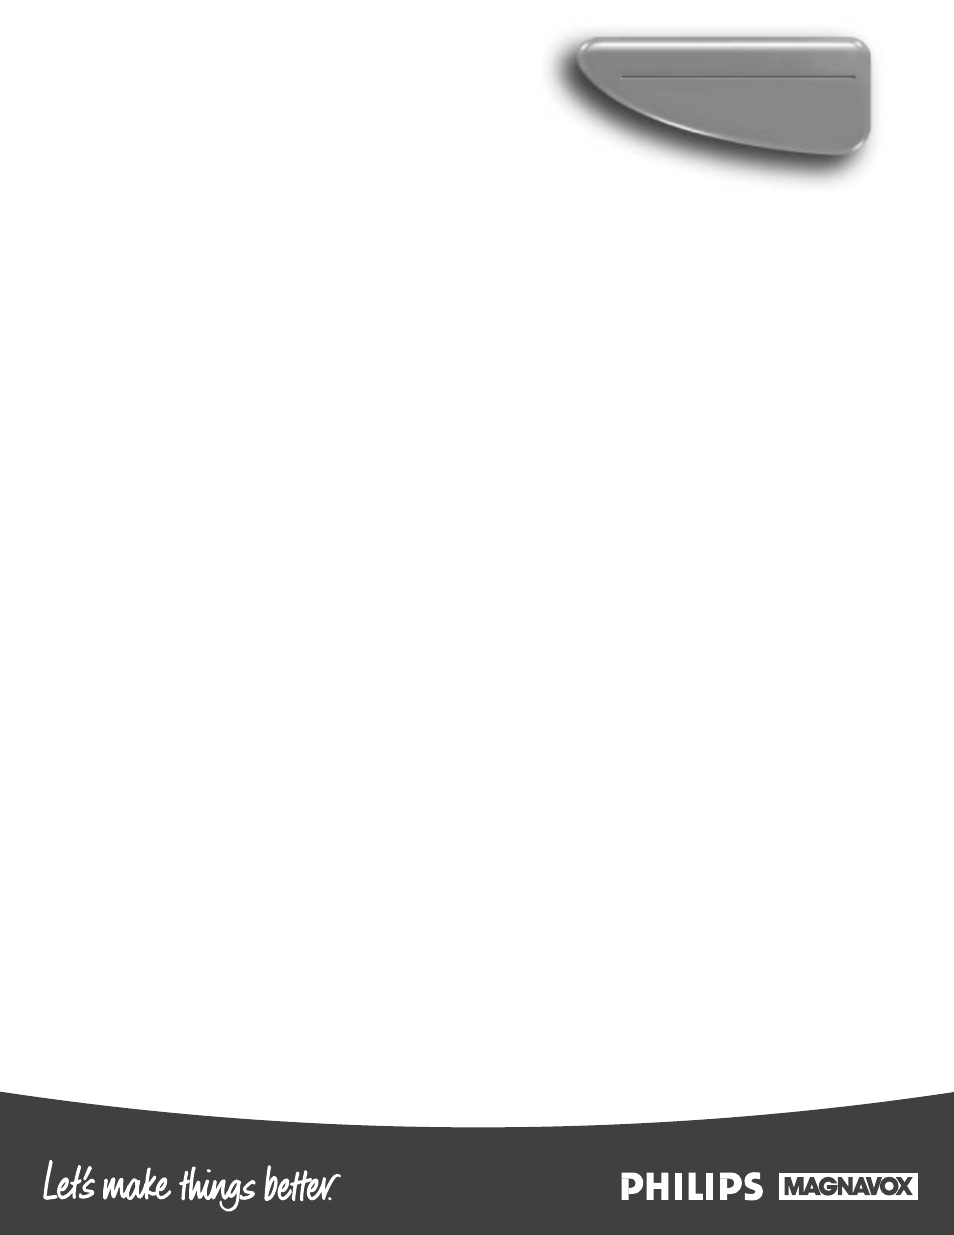 az2415 philips az241517 user manual page 2 2 original mode rh manualsdir com Philips TV Manual Philips Universal Remote User Manual